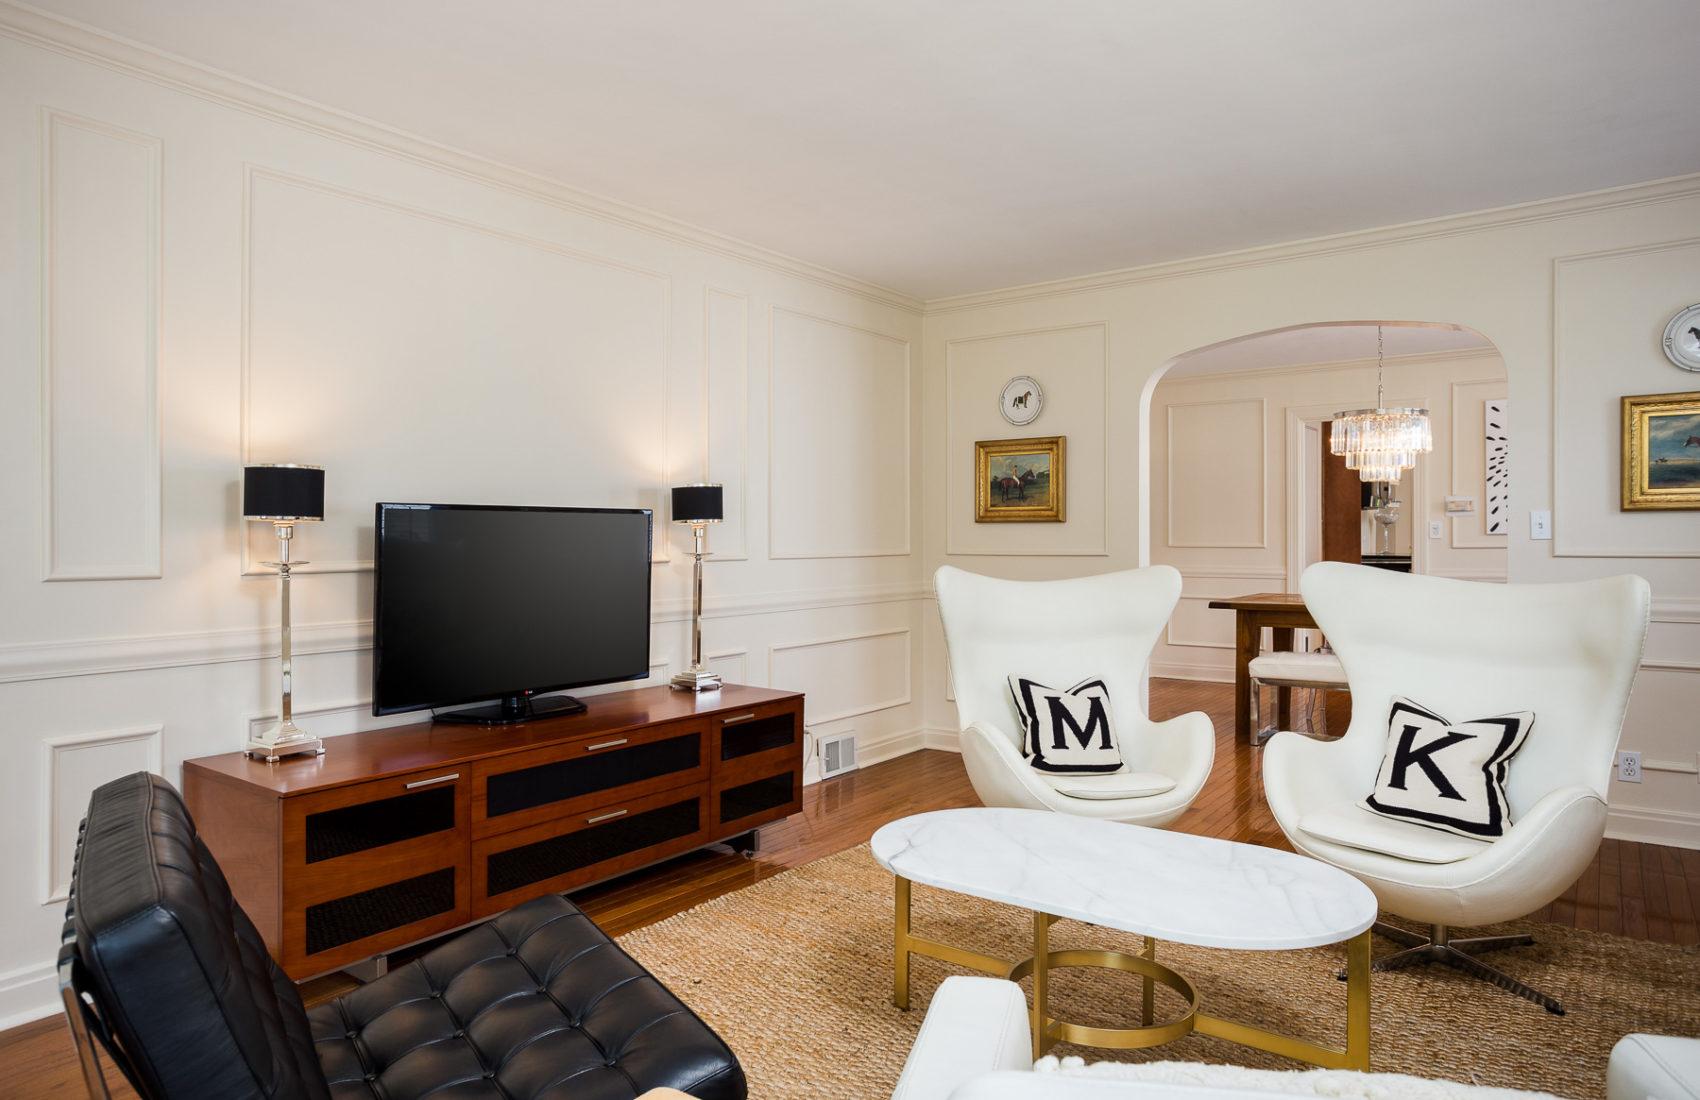 Interior and Architectural Portfolio